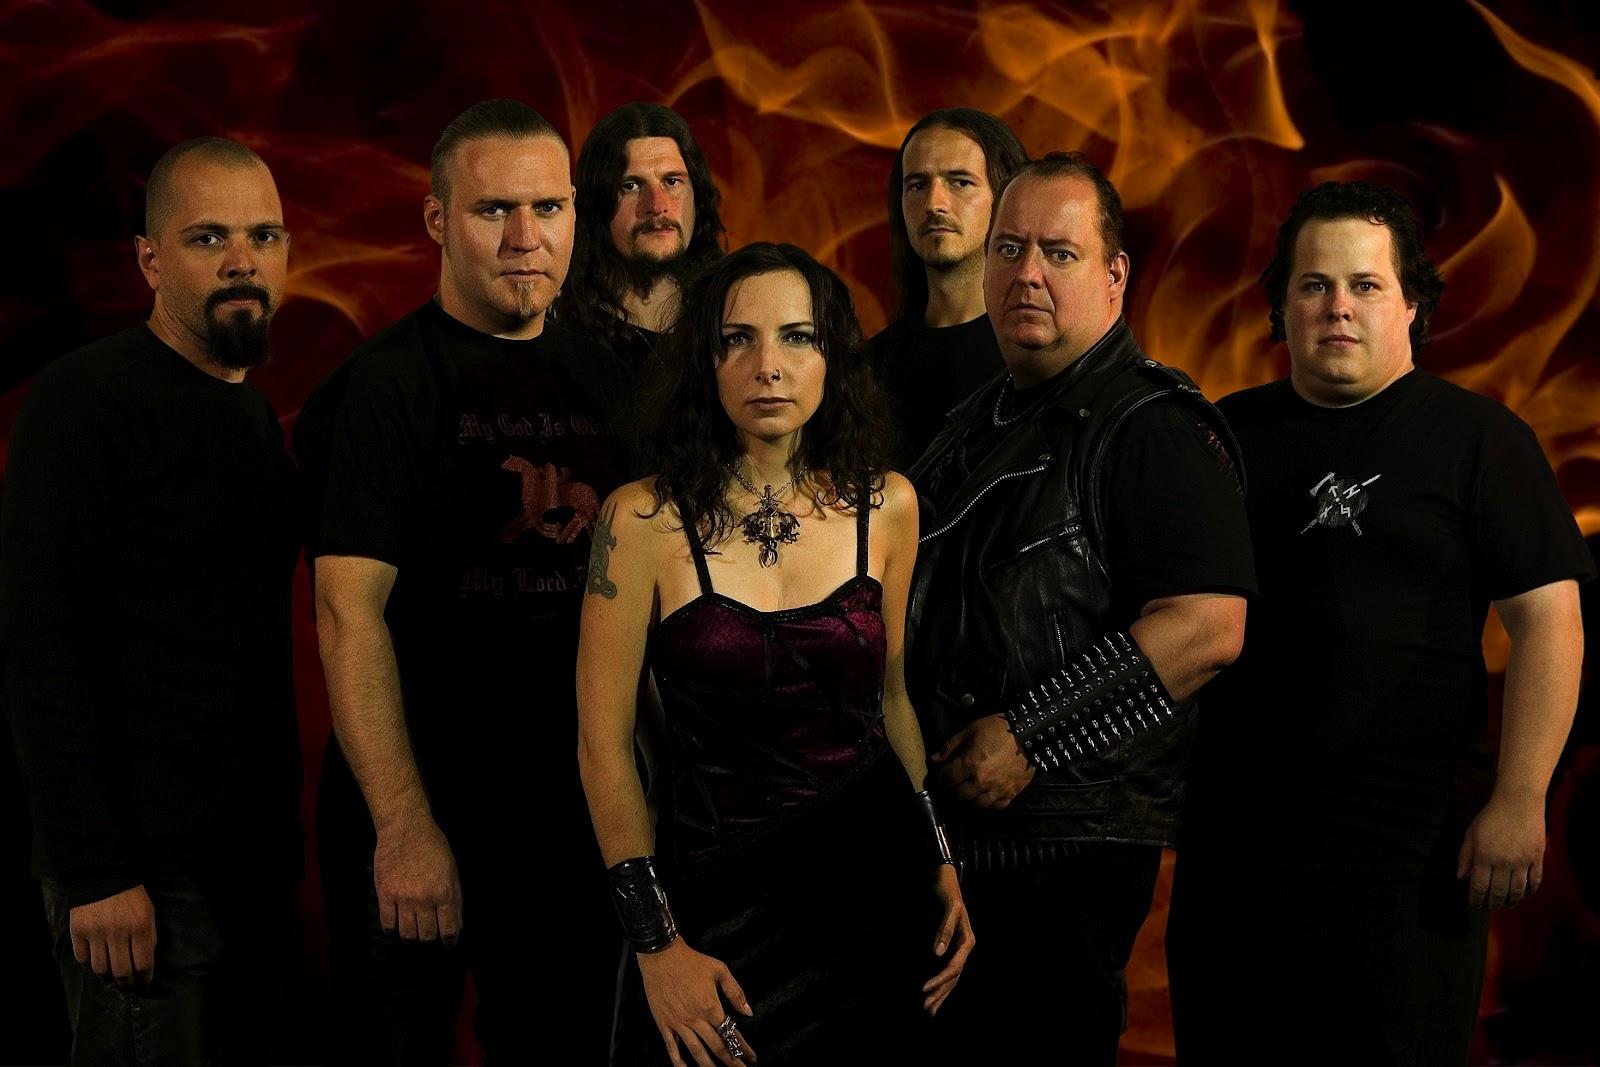 sirens of darkness list of female metal bands part 7. Black Bedroom Furniture Sets. Home Design Ideas